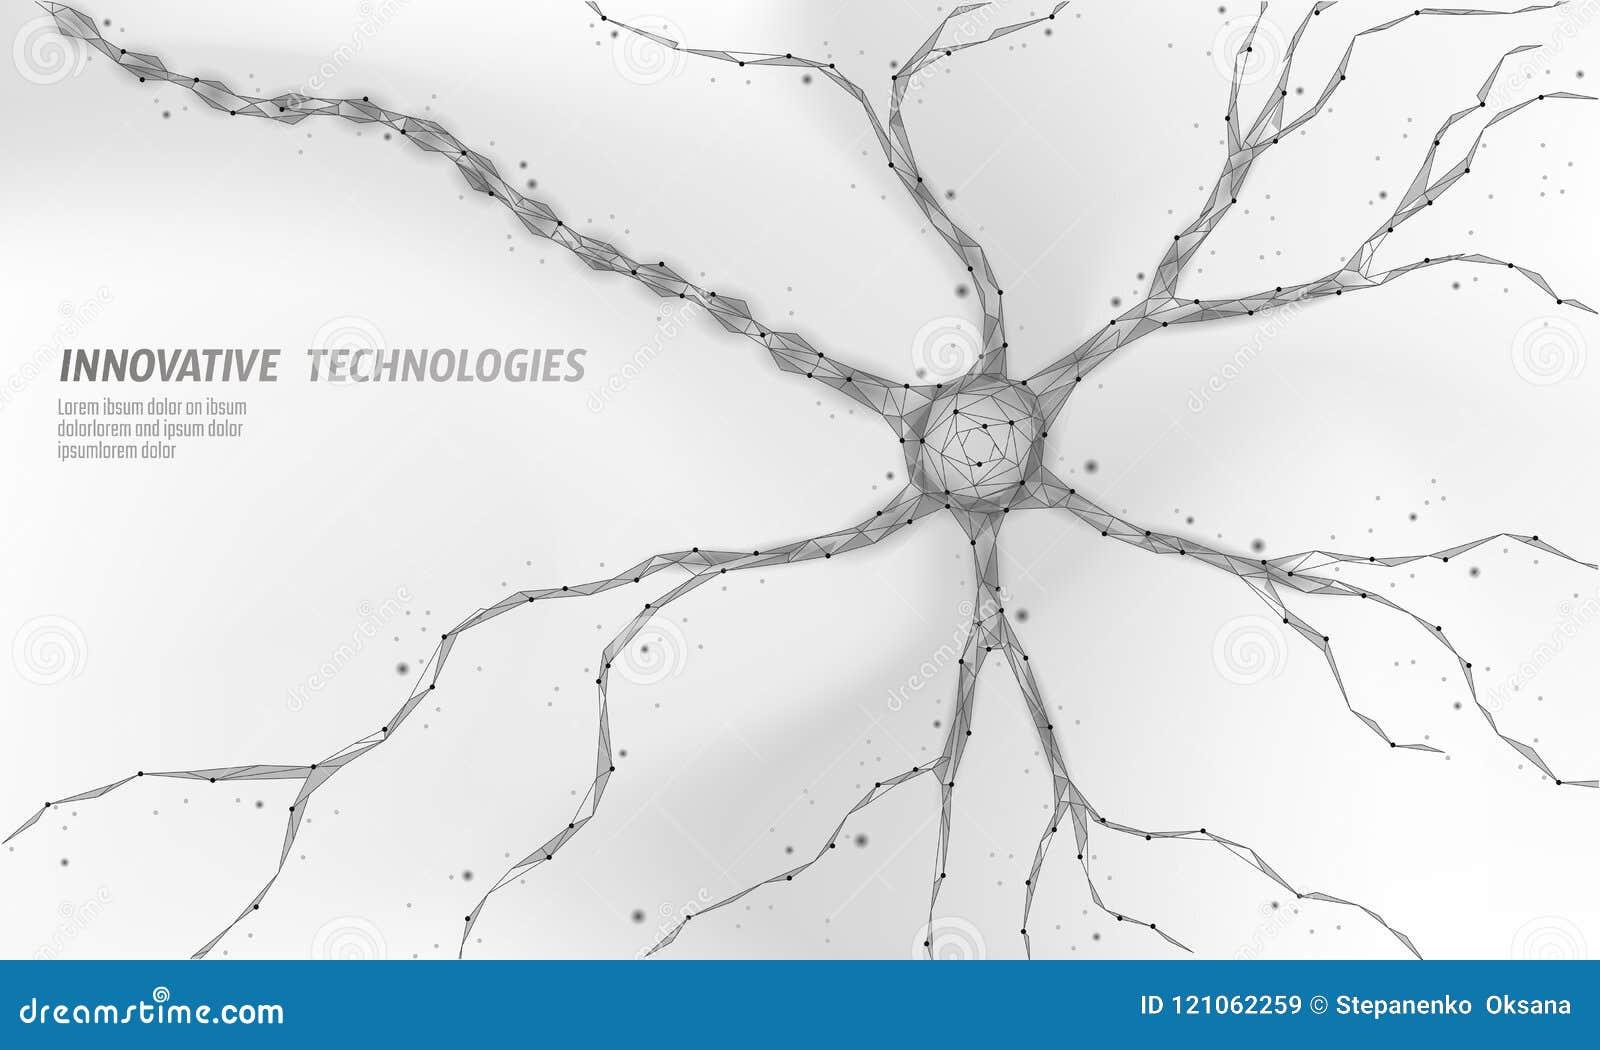 Human neuron low poly anatomy concept. Artificial neural network technology science medicine cloud computing. AI 3D